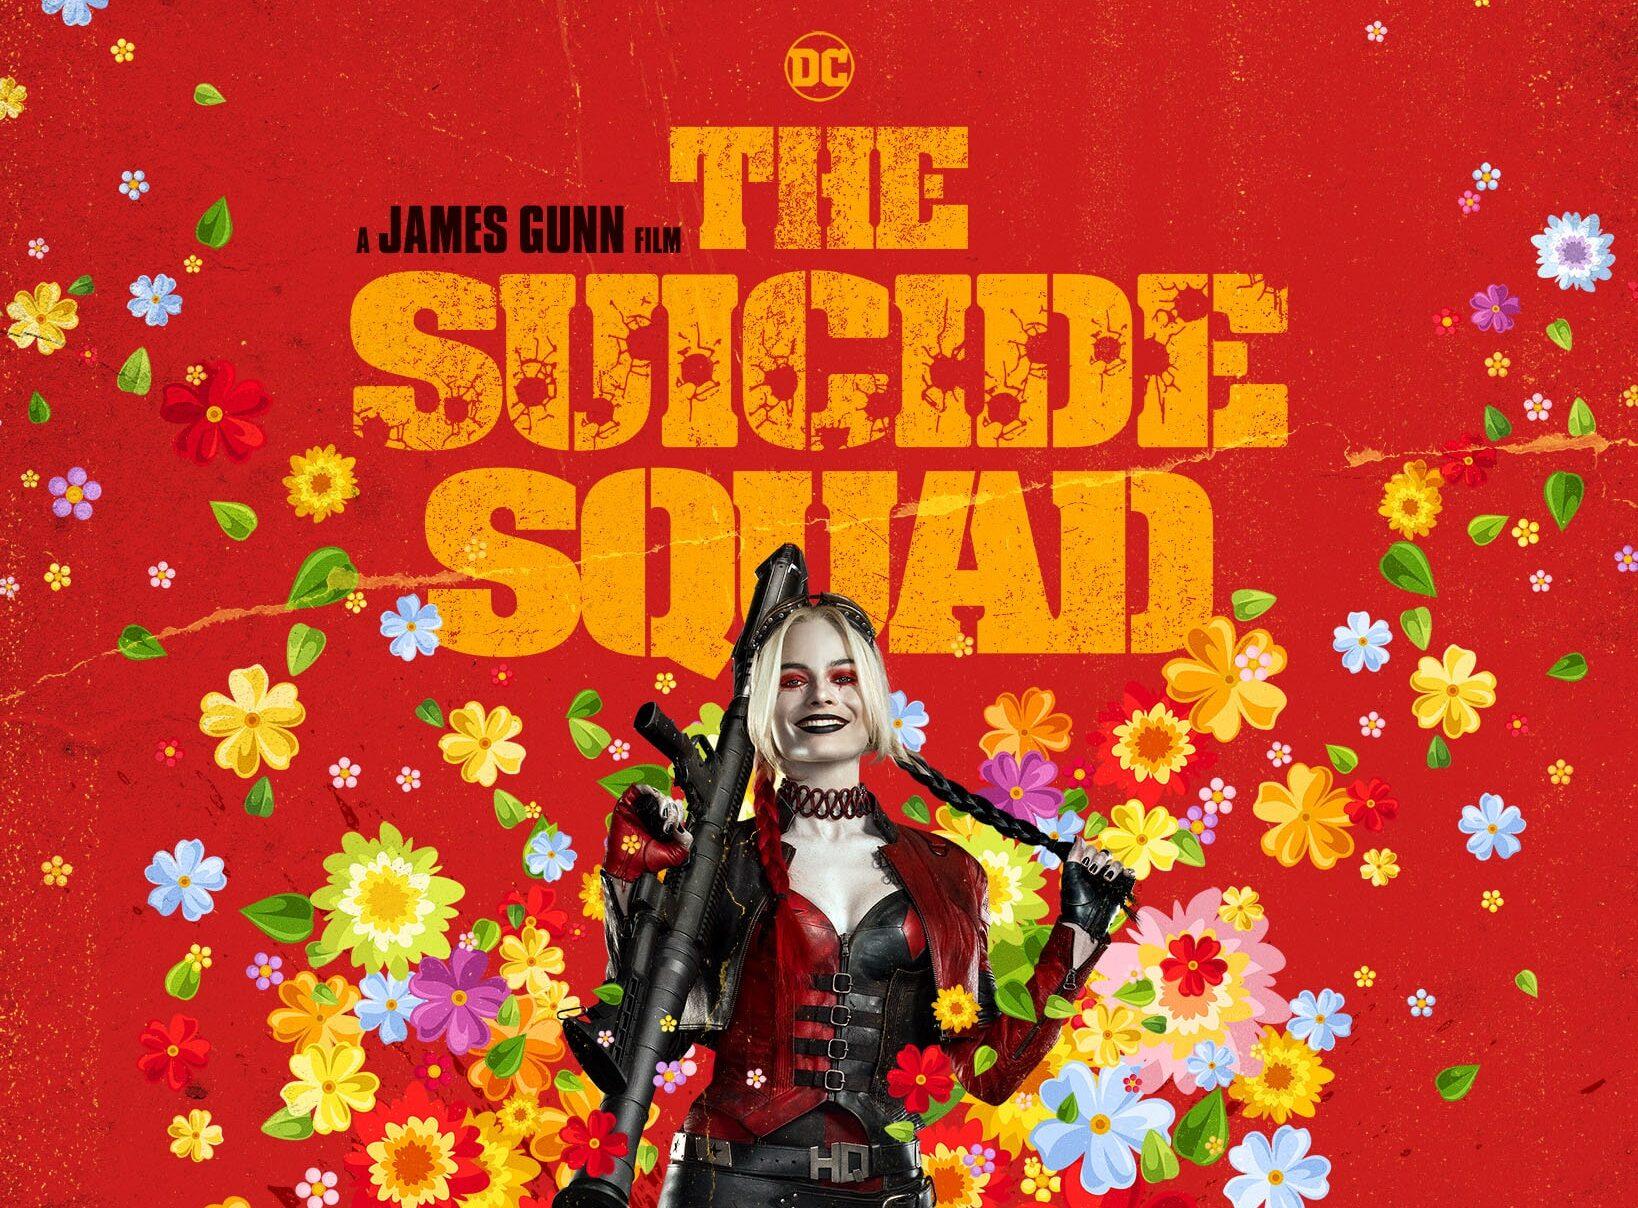 SUISQ2 Character Art Harley Quinn INSTAVERT 1638X2048 DOM min e1616800663547